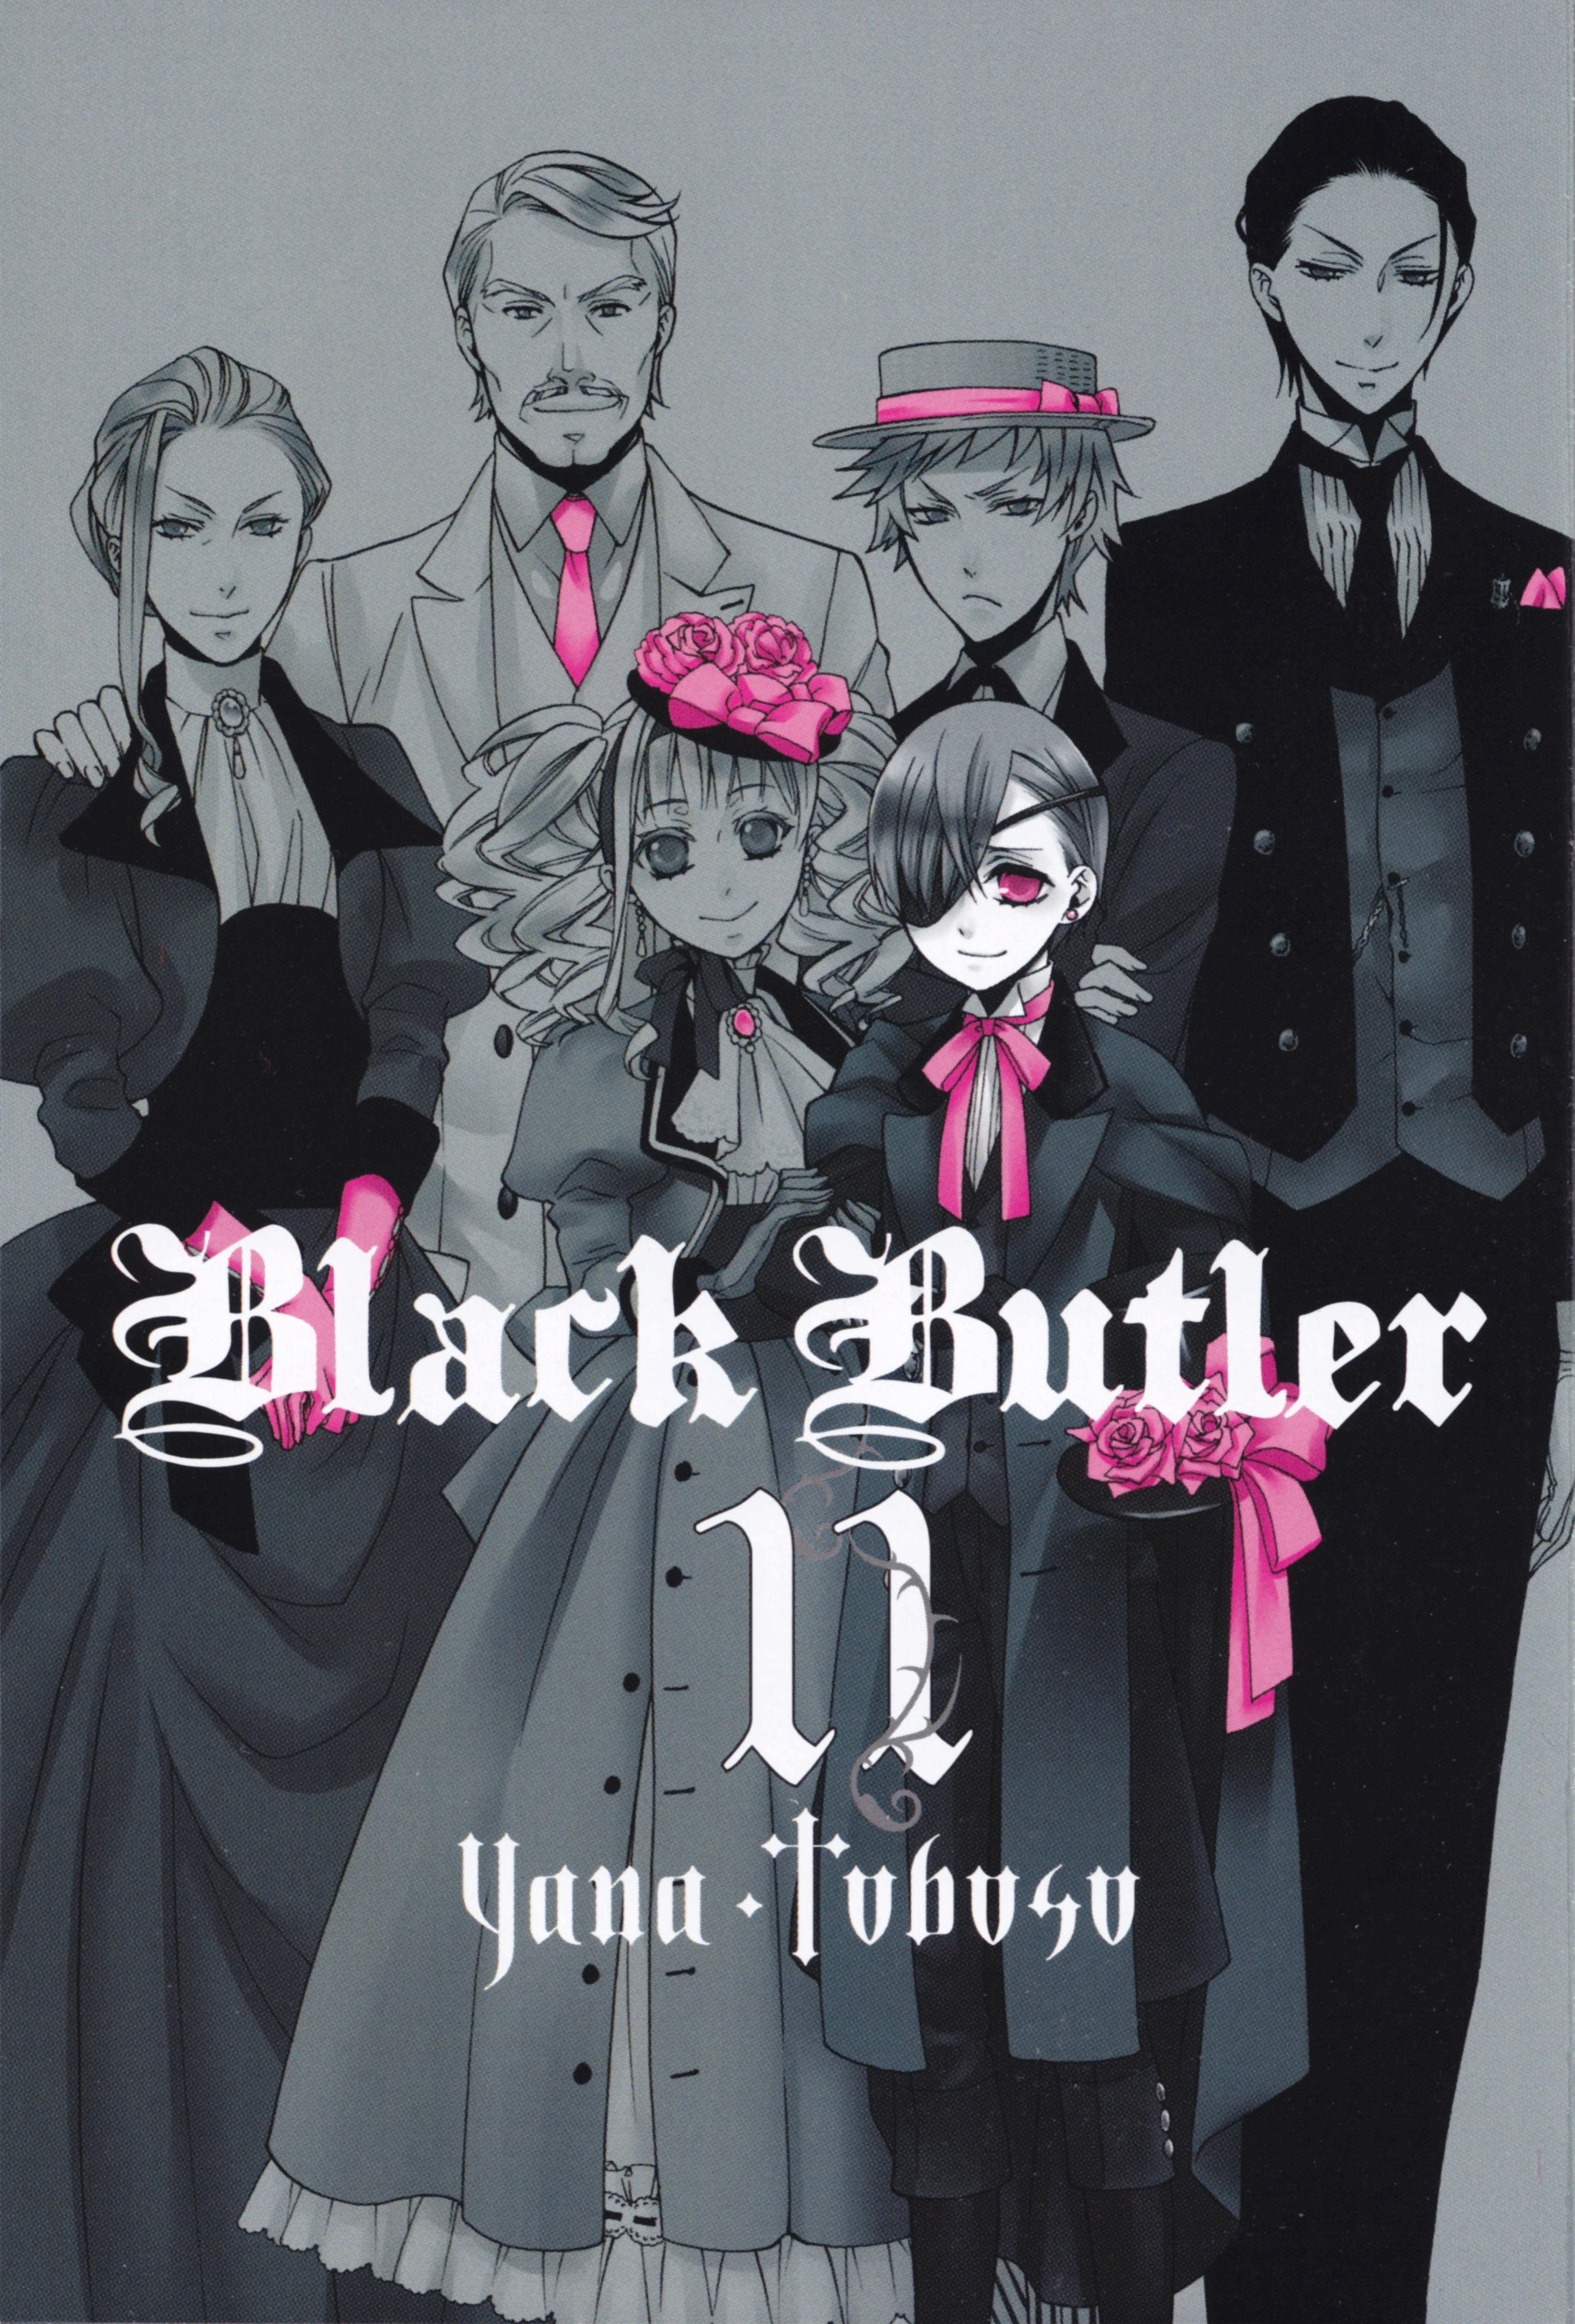 Kuroshitsuji Black Butler Toboso Yana Mobile Wallpaper